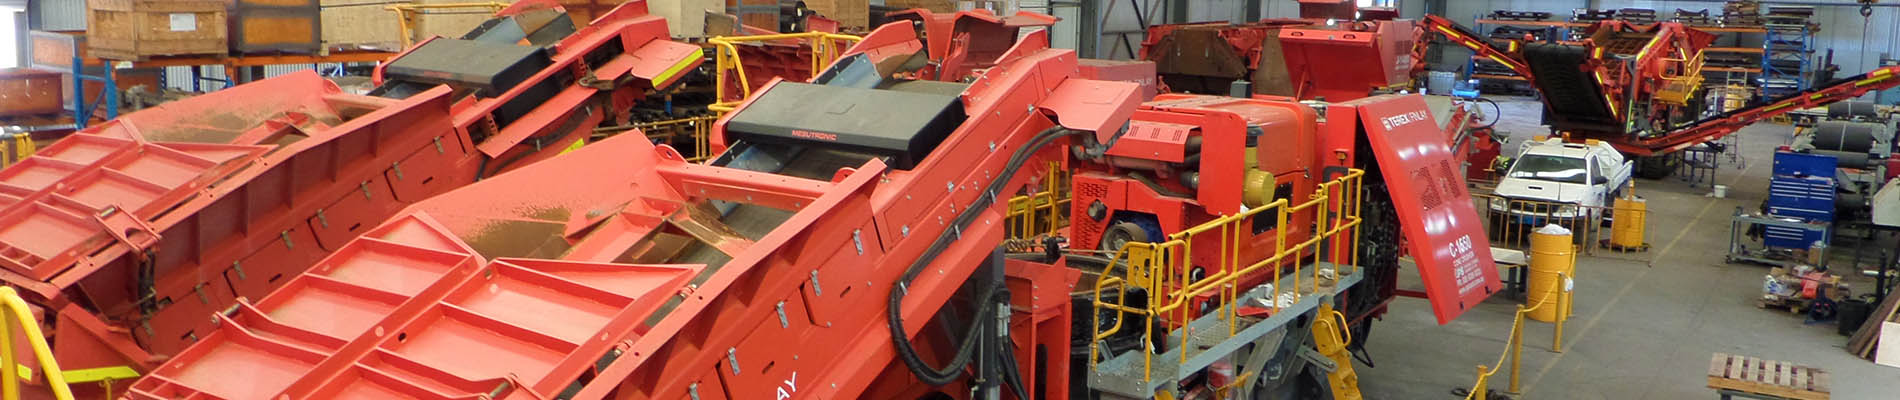 OPS Screening & Crushing Equipment